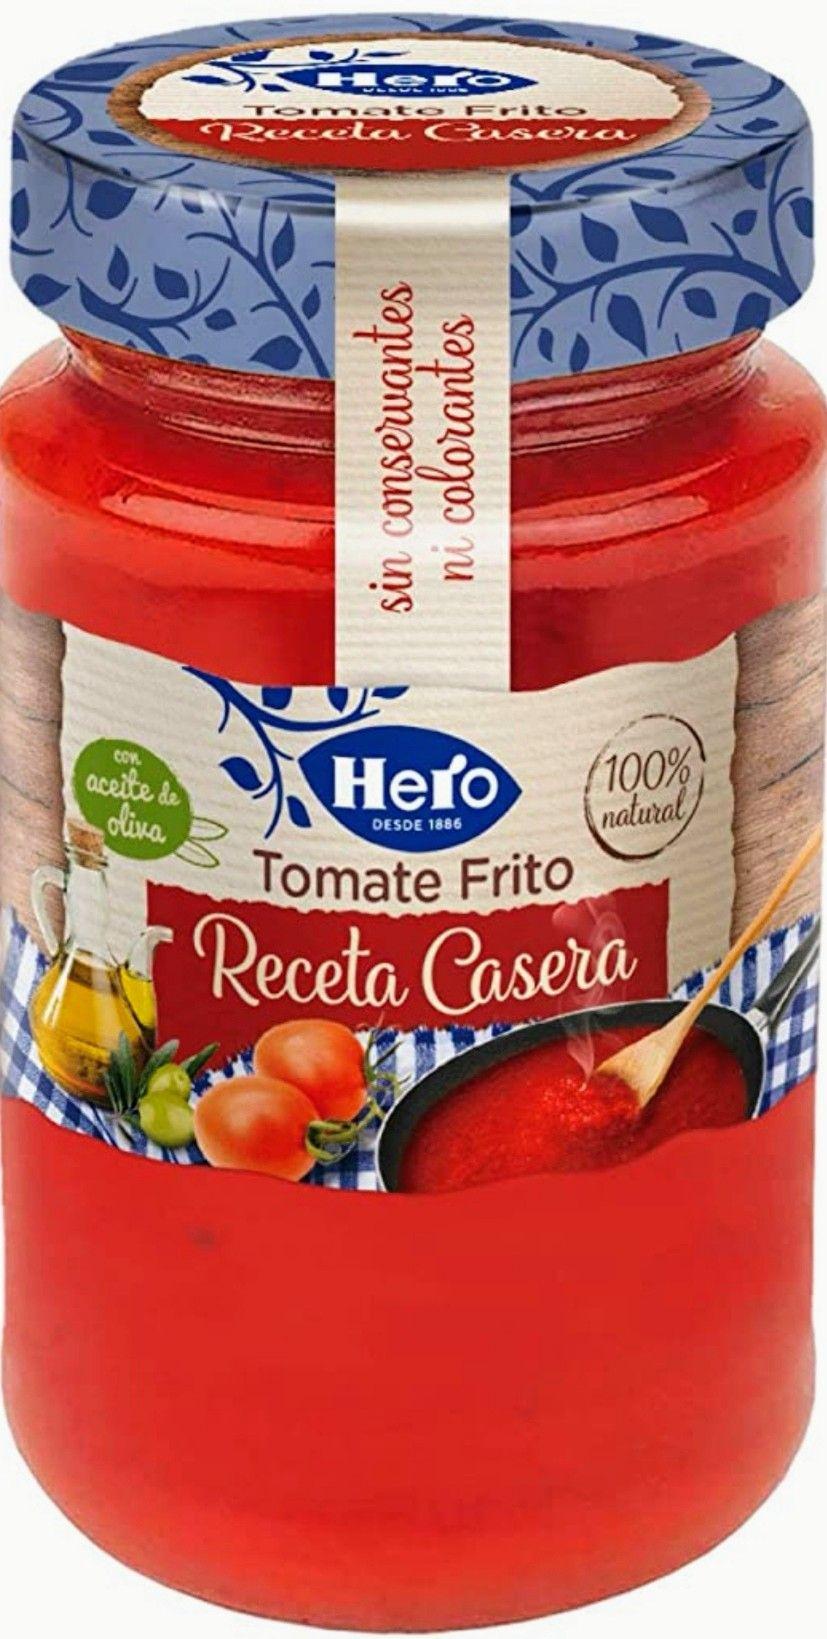 HERO - Tomate Frito,con Aceite de oliva, receta casera 370 g.(Precio mínimo)